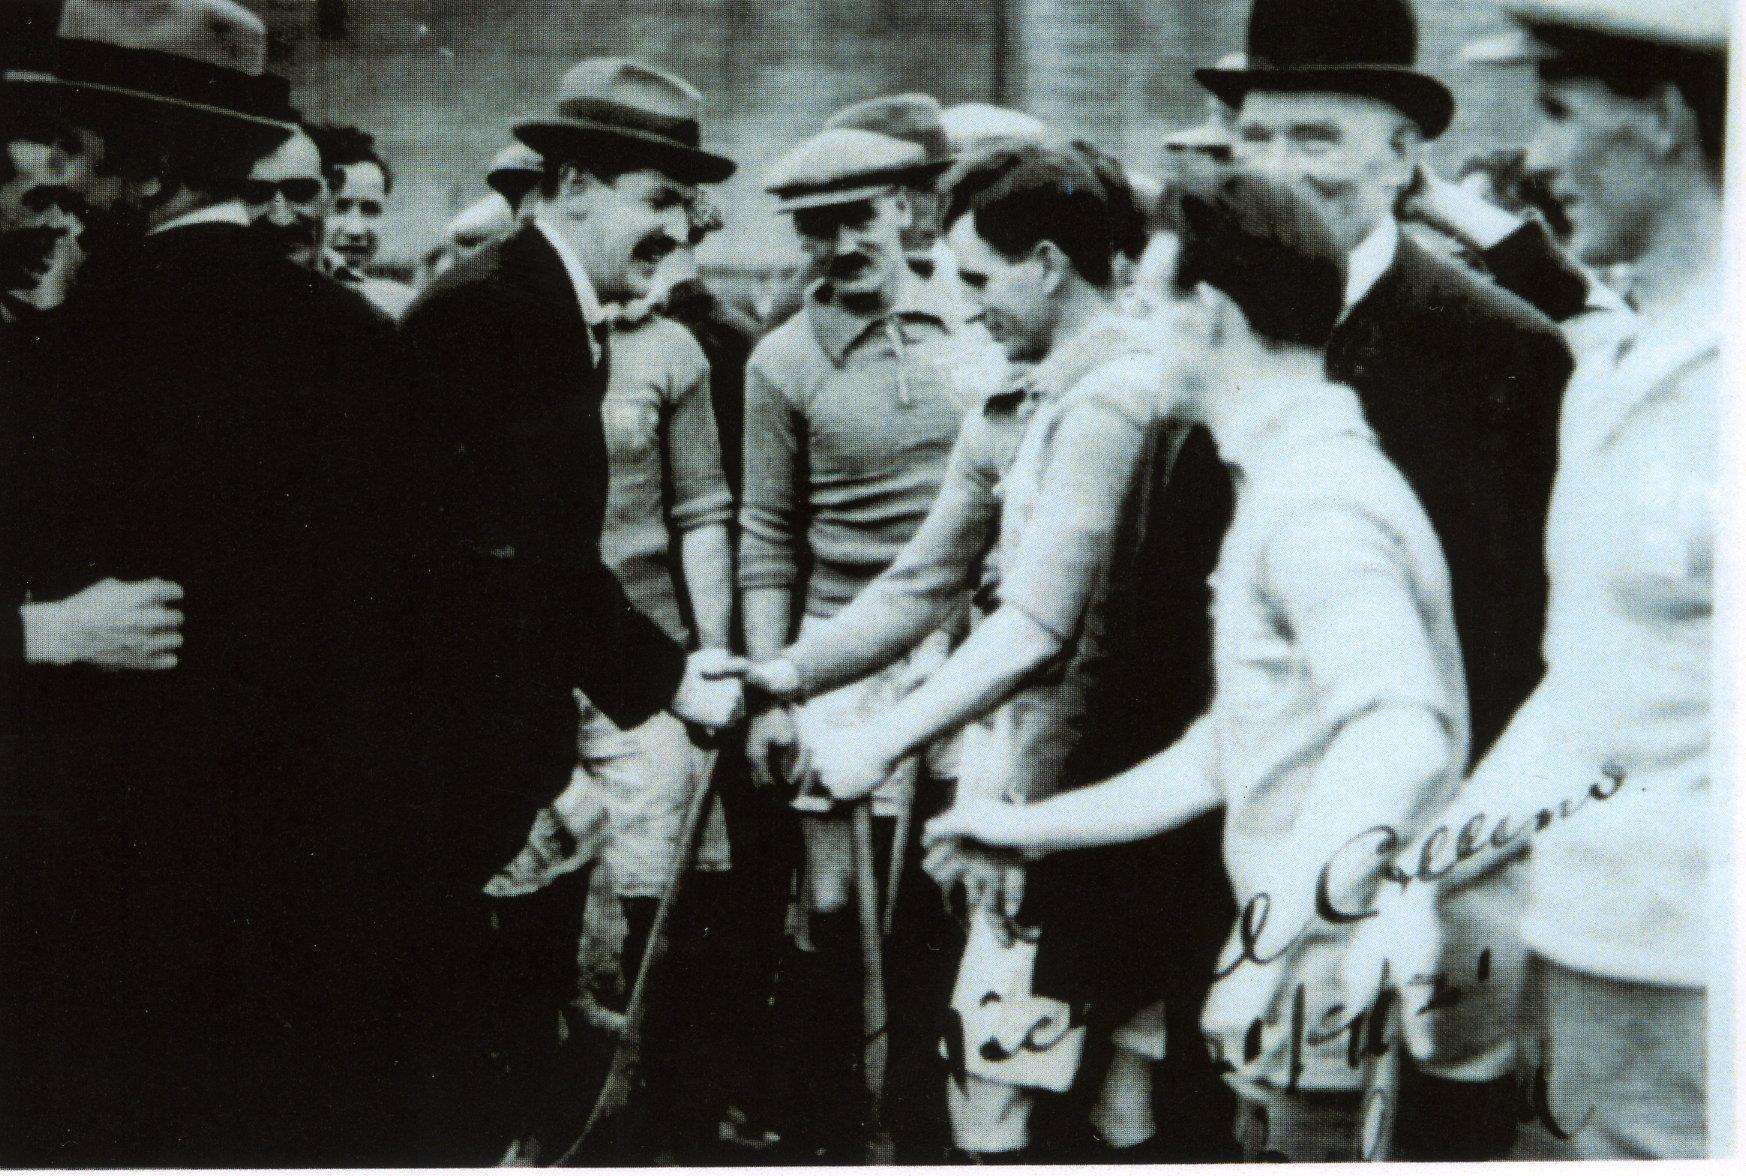 Michael Collins meeting the Dublin team at Croke Park, 1921